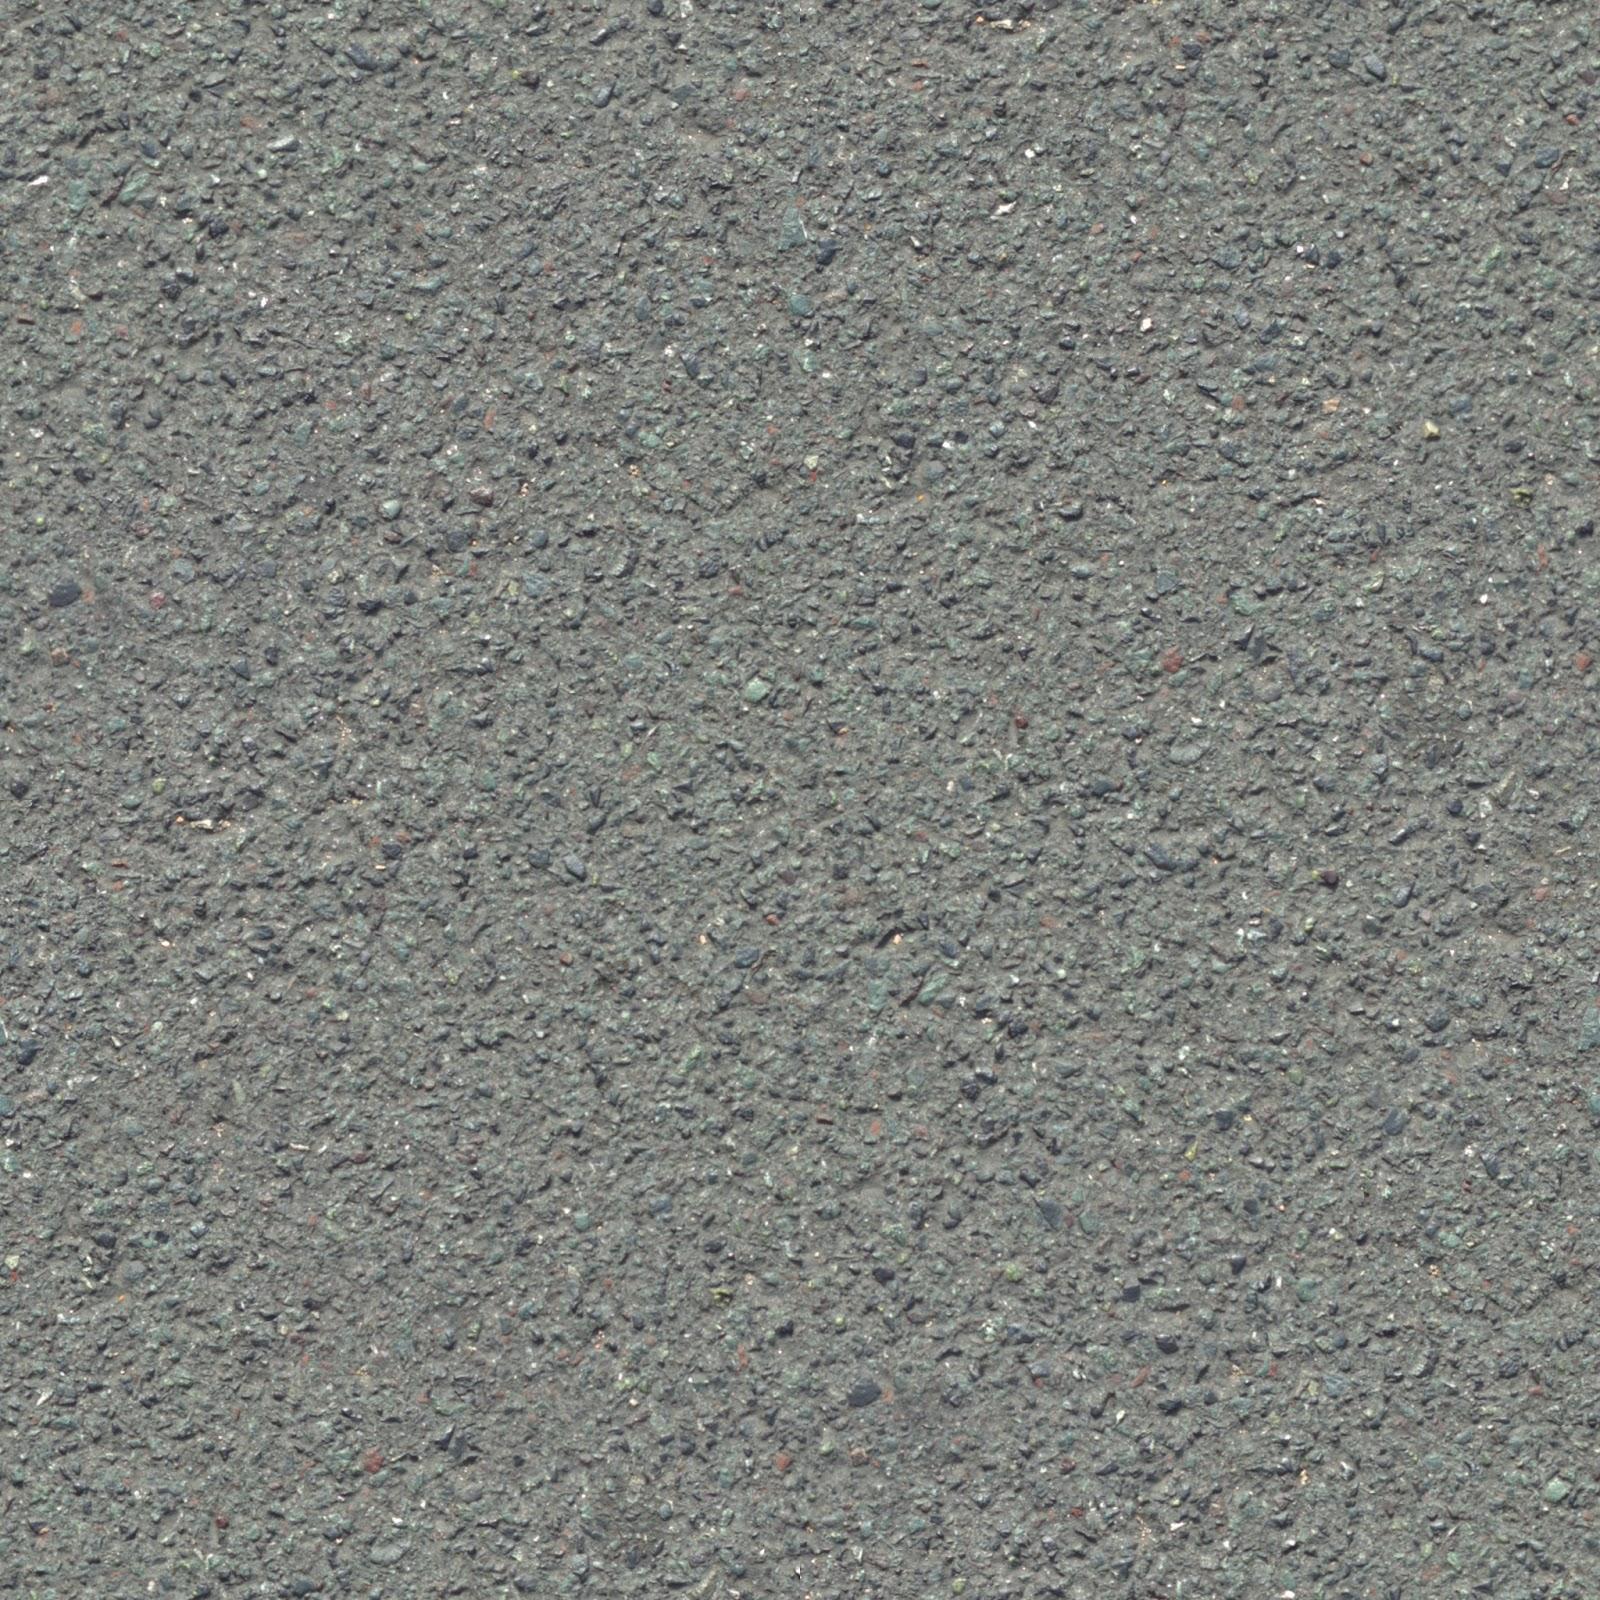 High Resolution Seamless Textures: (ASPHALT 2) tarmac road ...